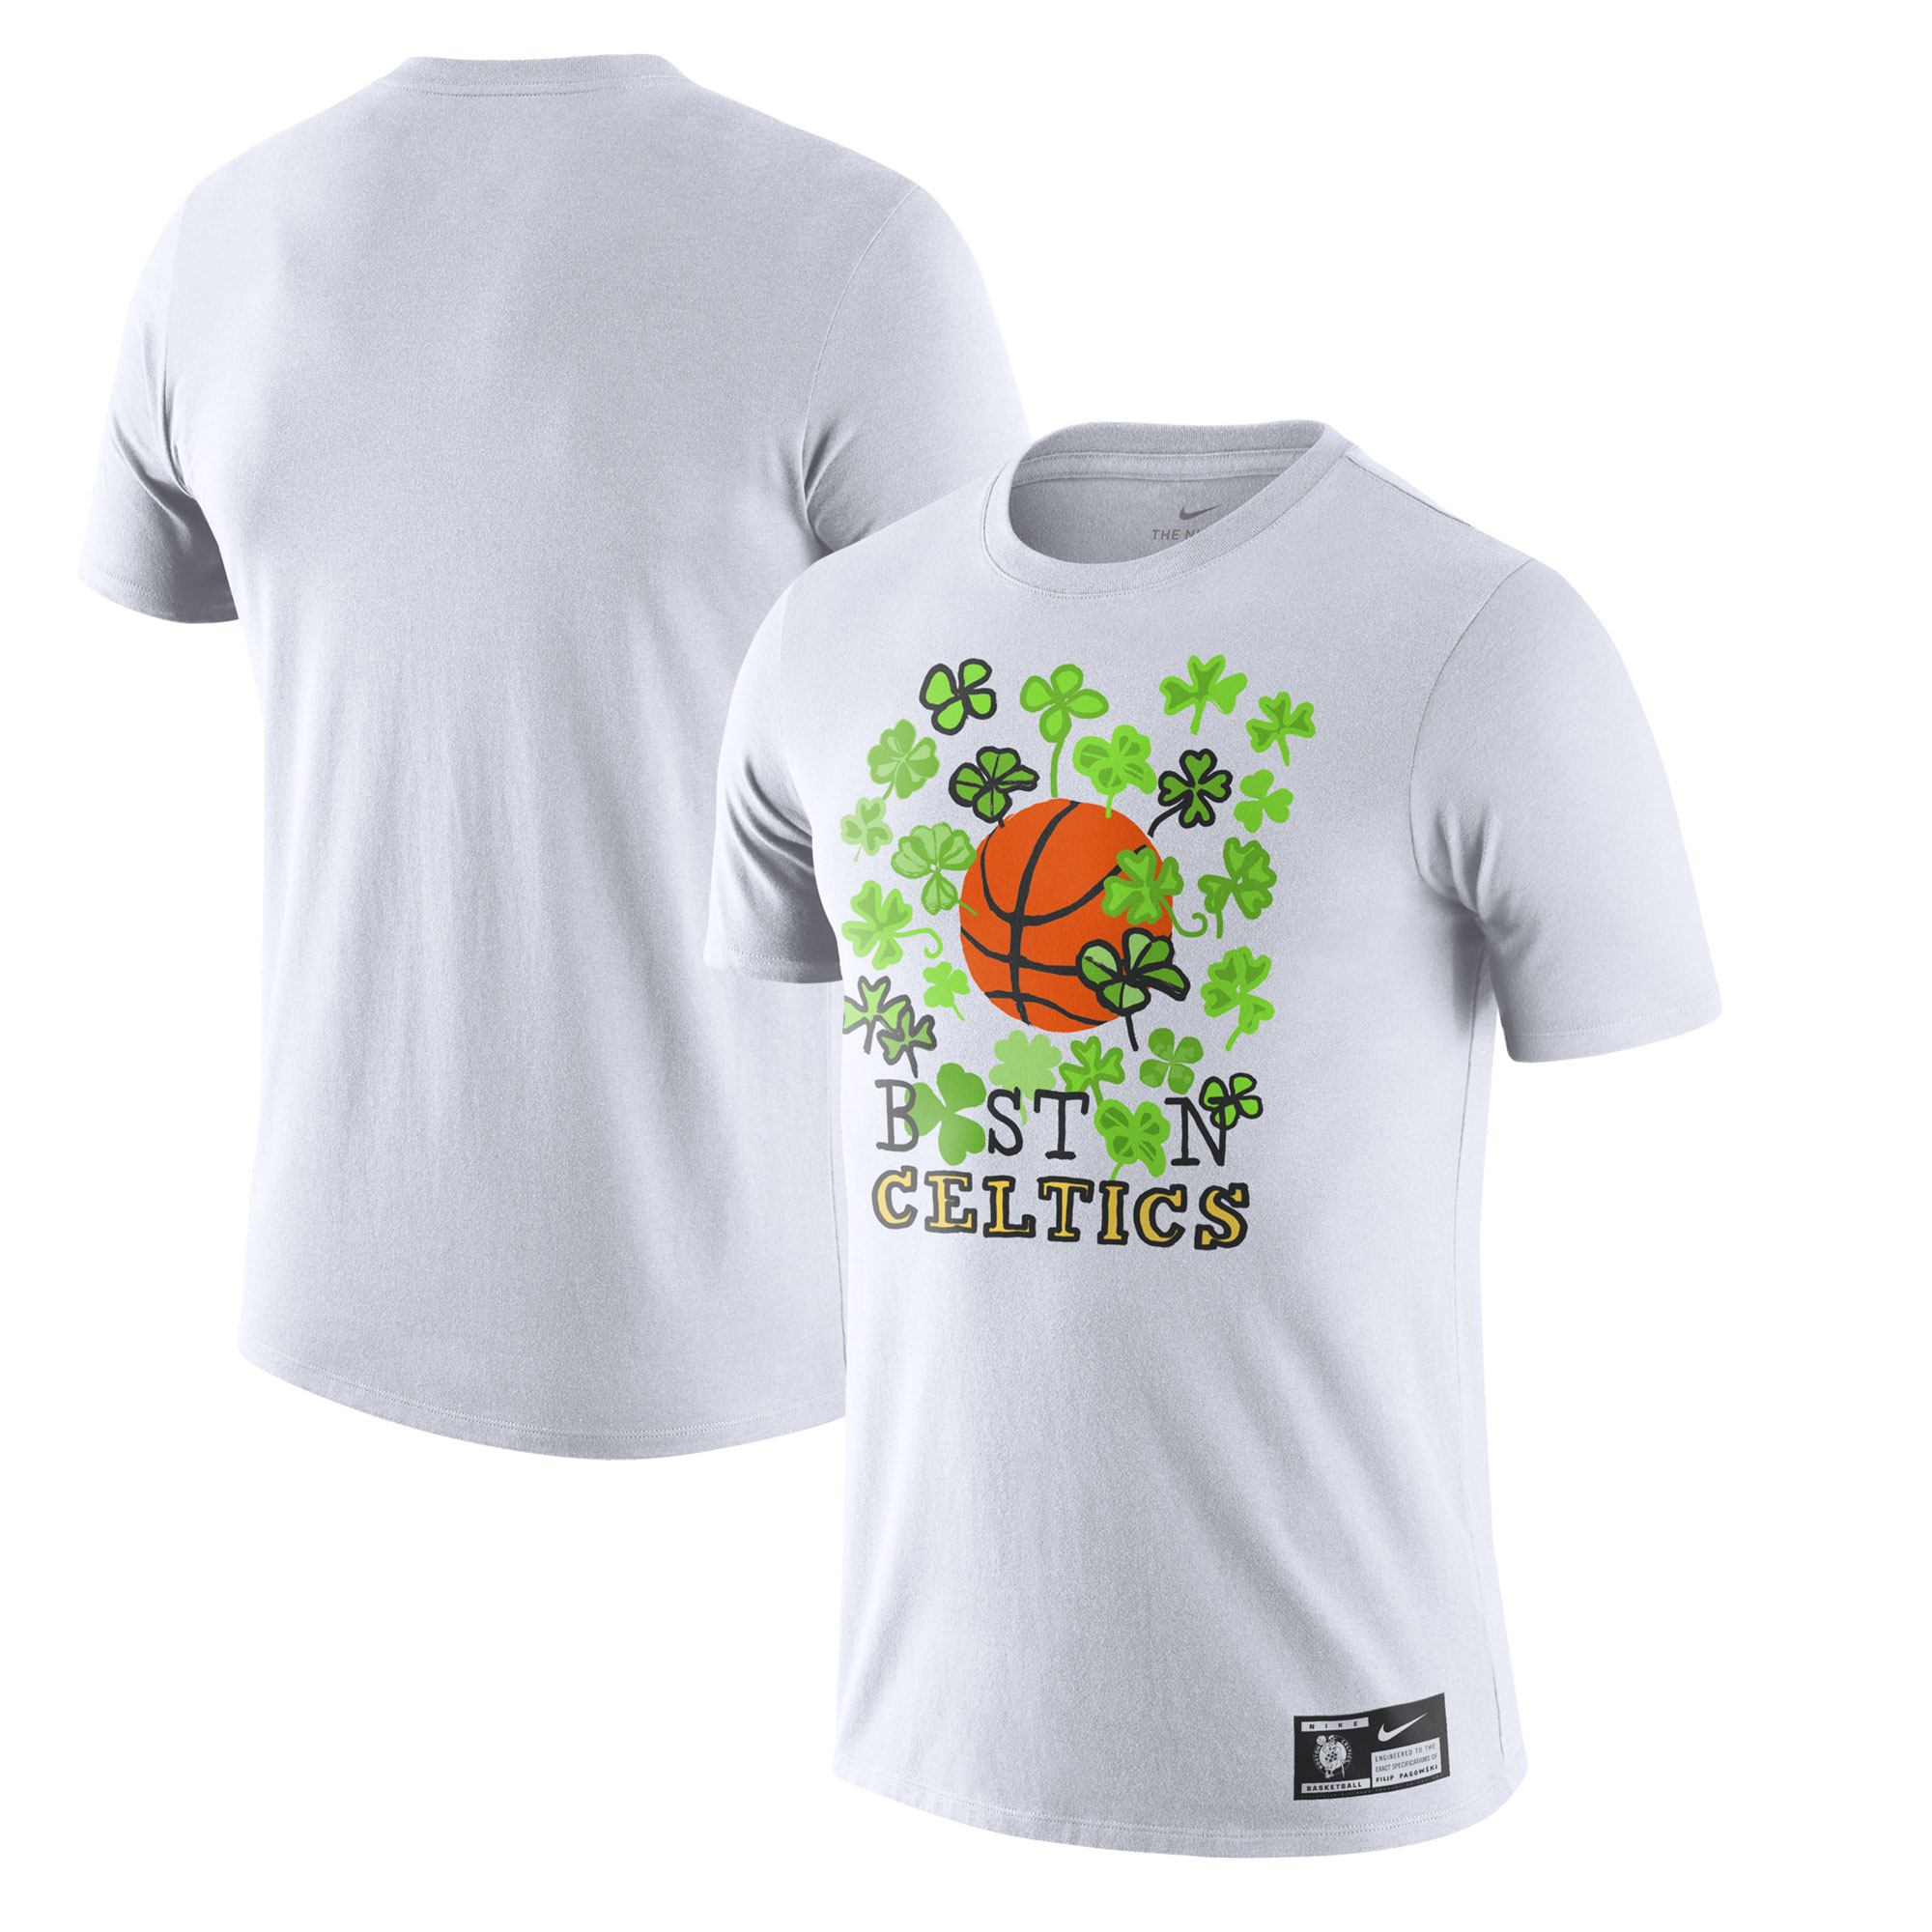 Boston Celtics Nike Pagowski Collab T-Shirt - White